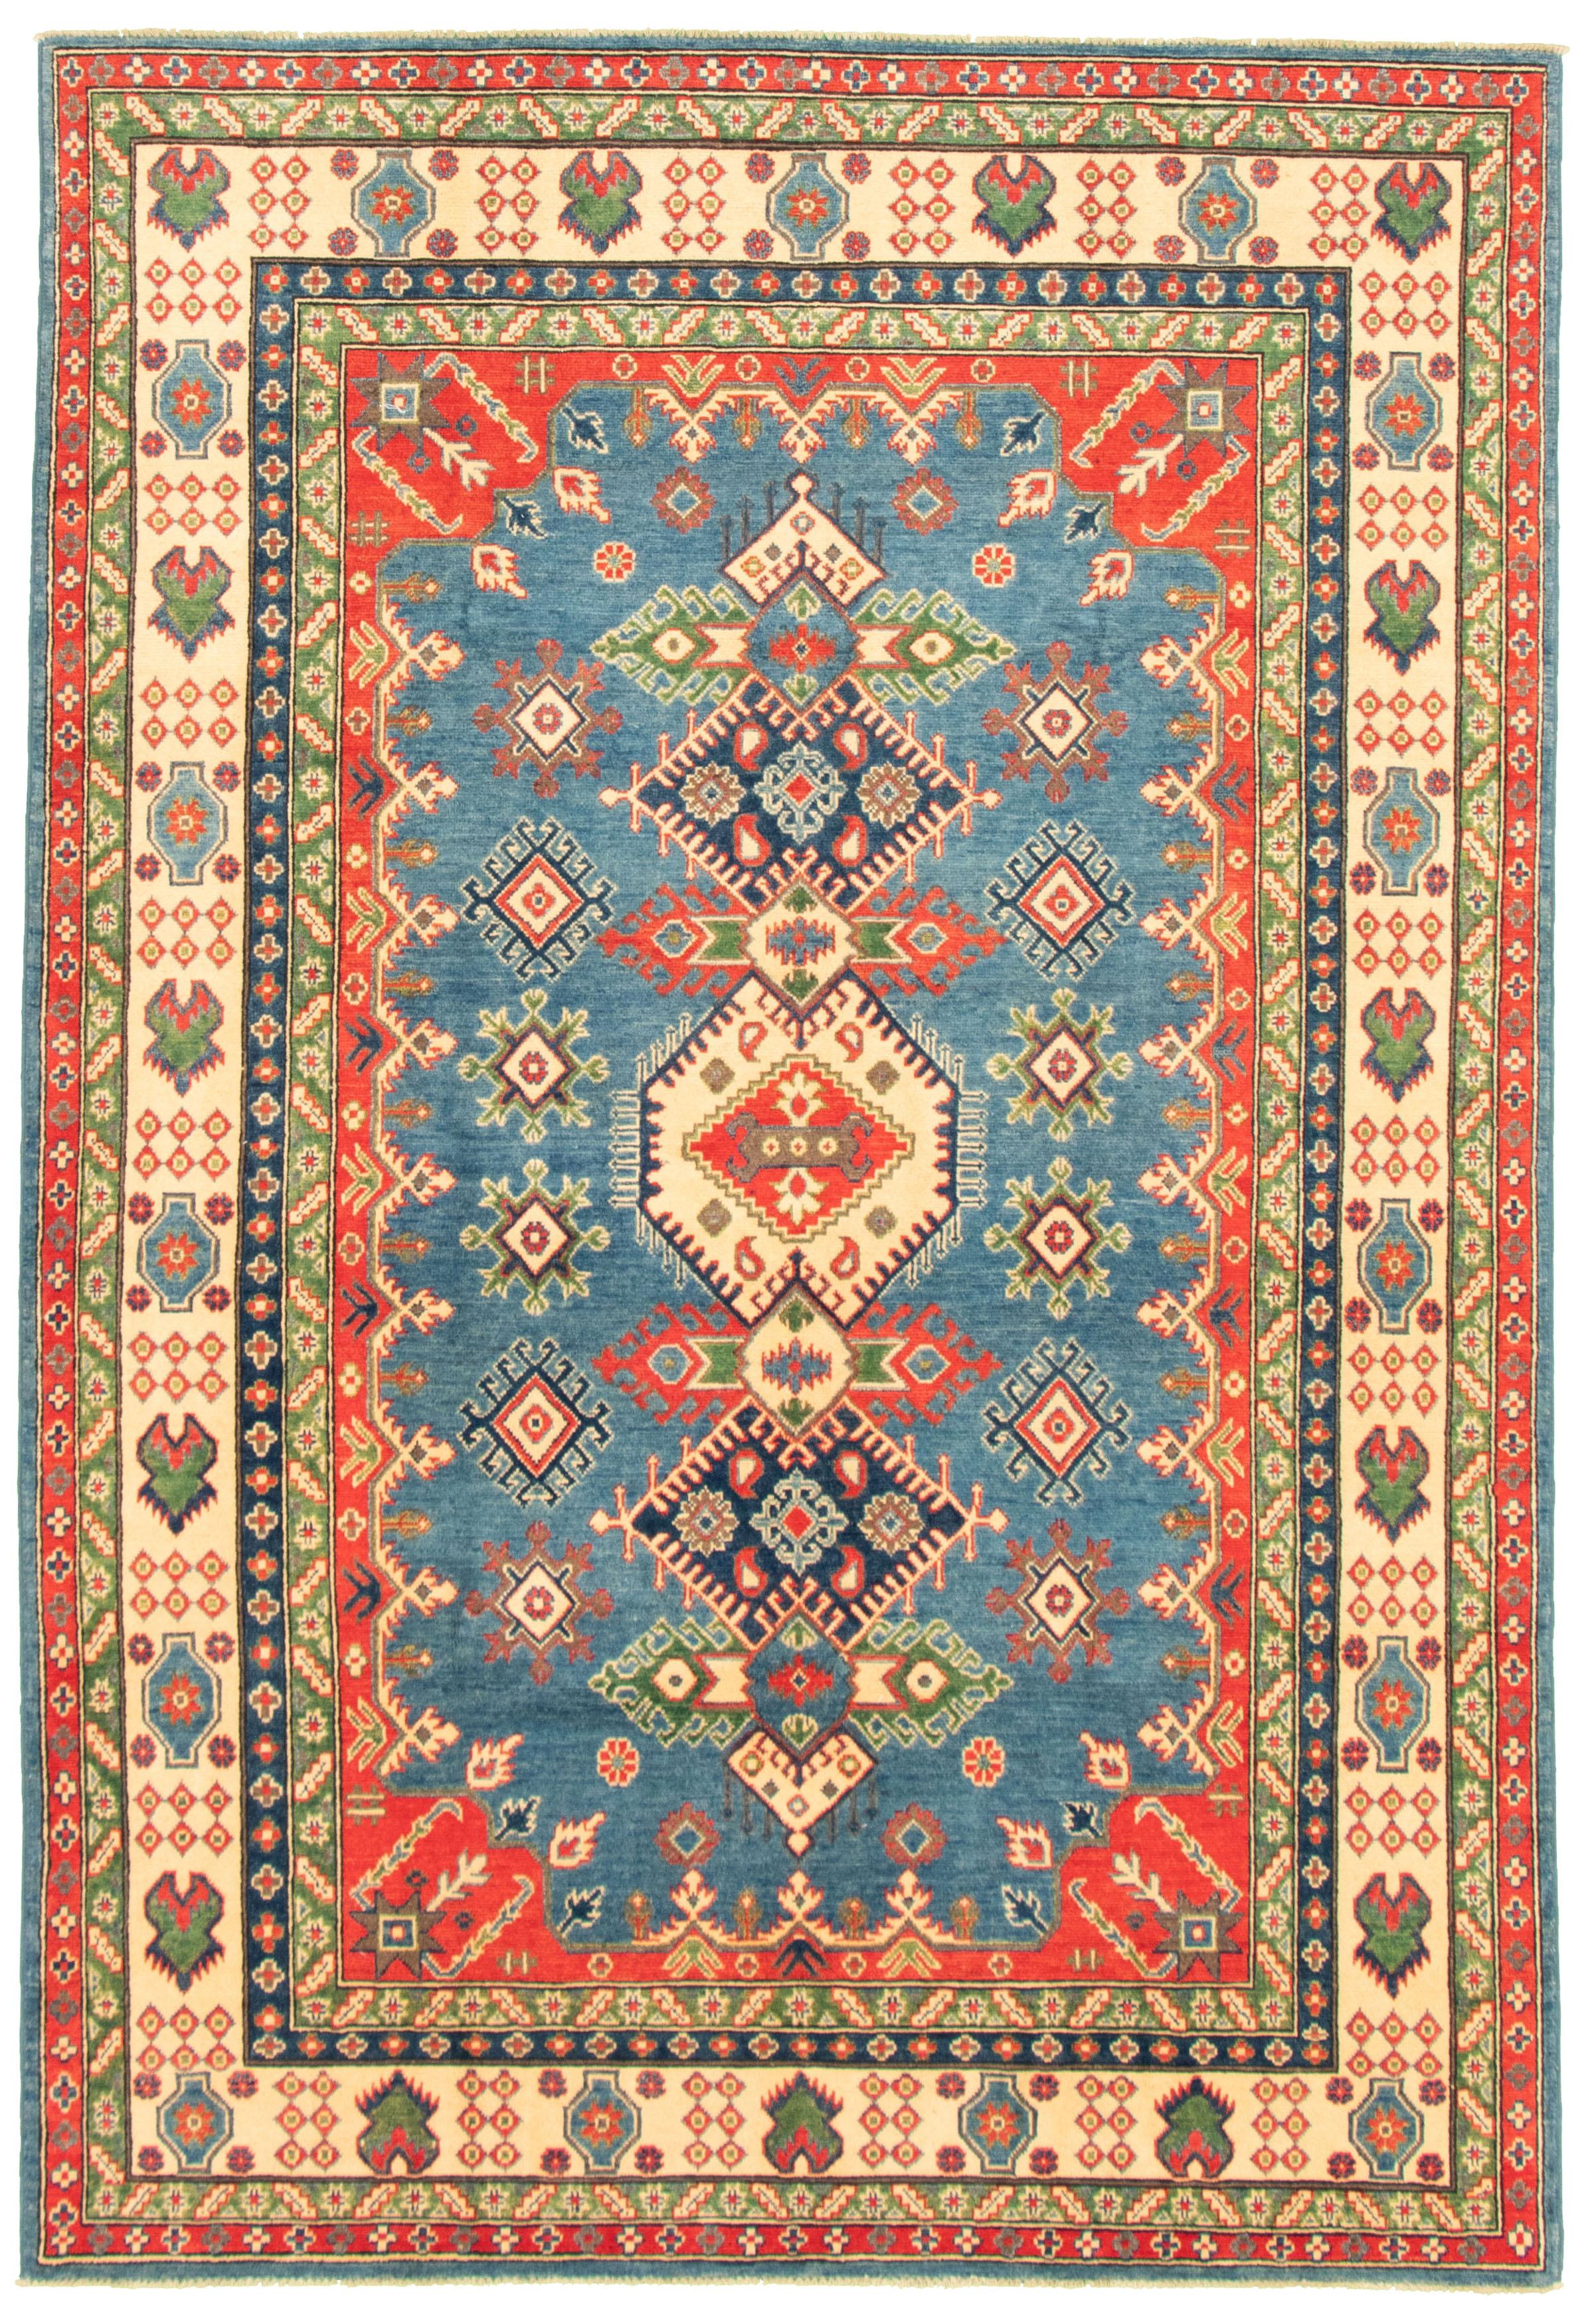 "Hand-knotted Finest Gazni Dark Blue Wool Rug 6'7"" x 9'9"" Size: 6'7"" x 9'9"""